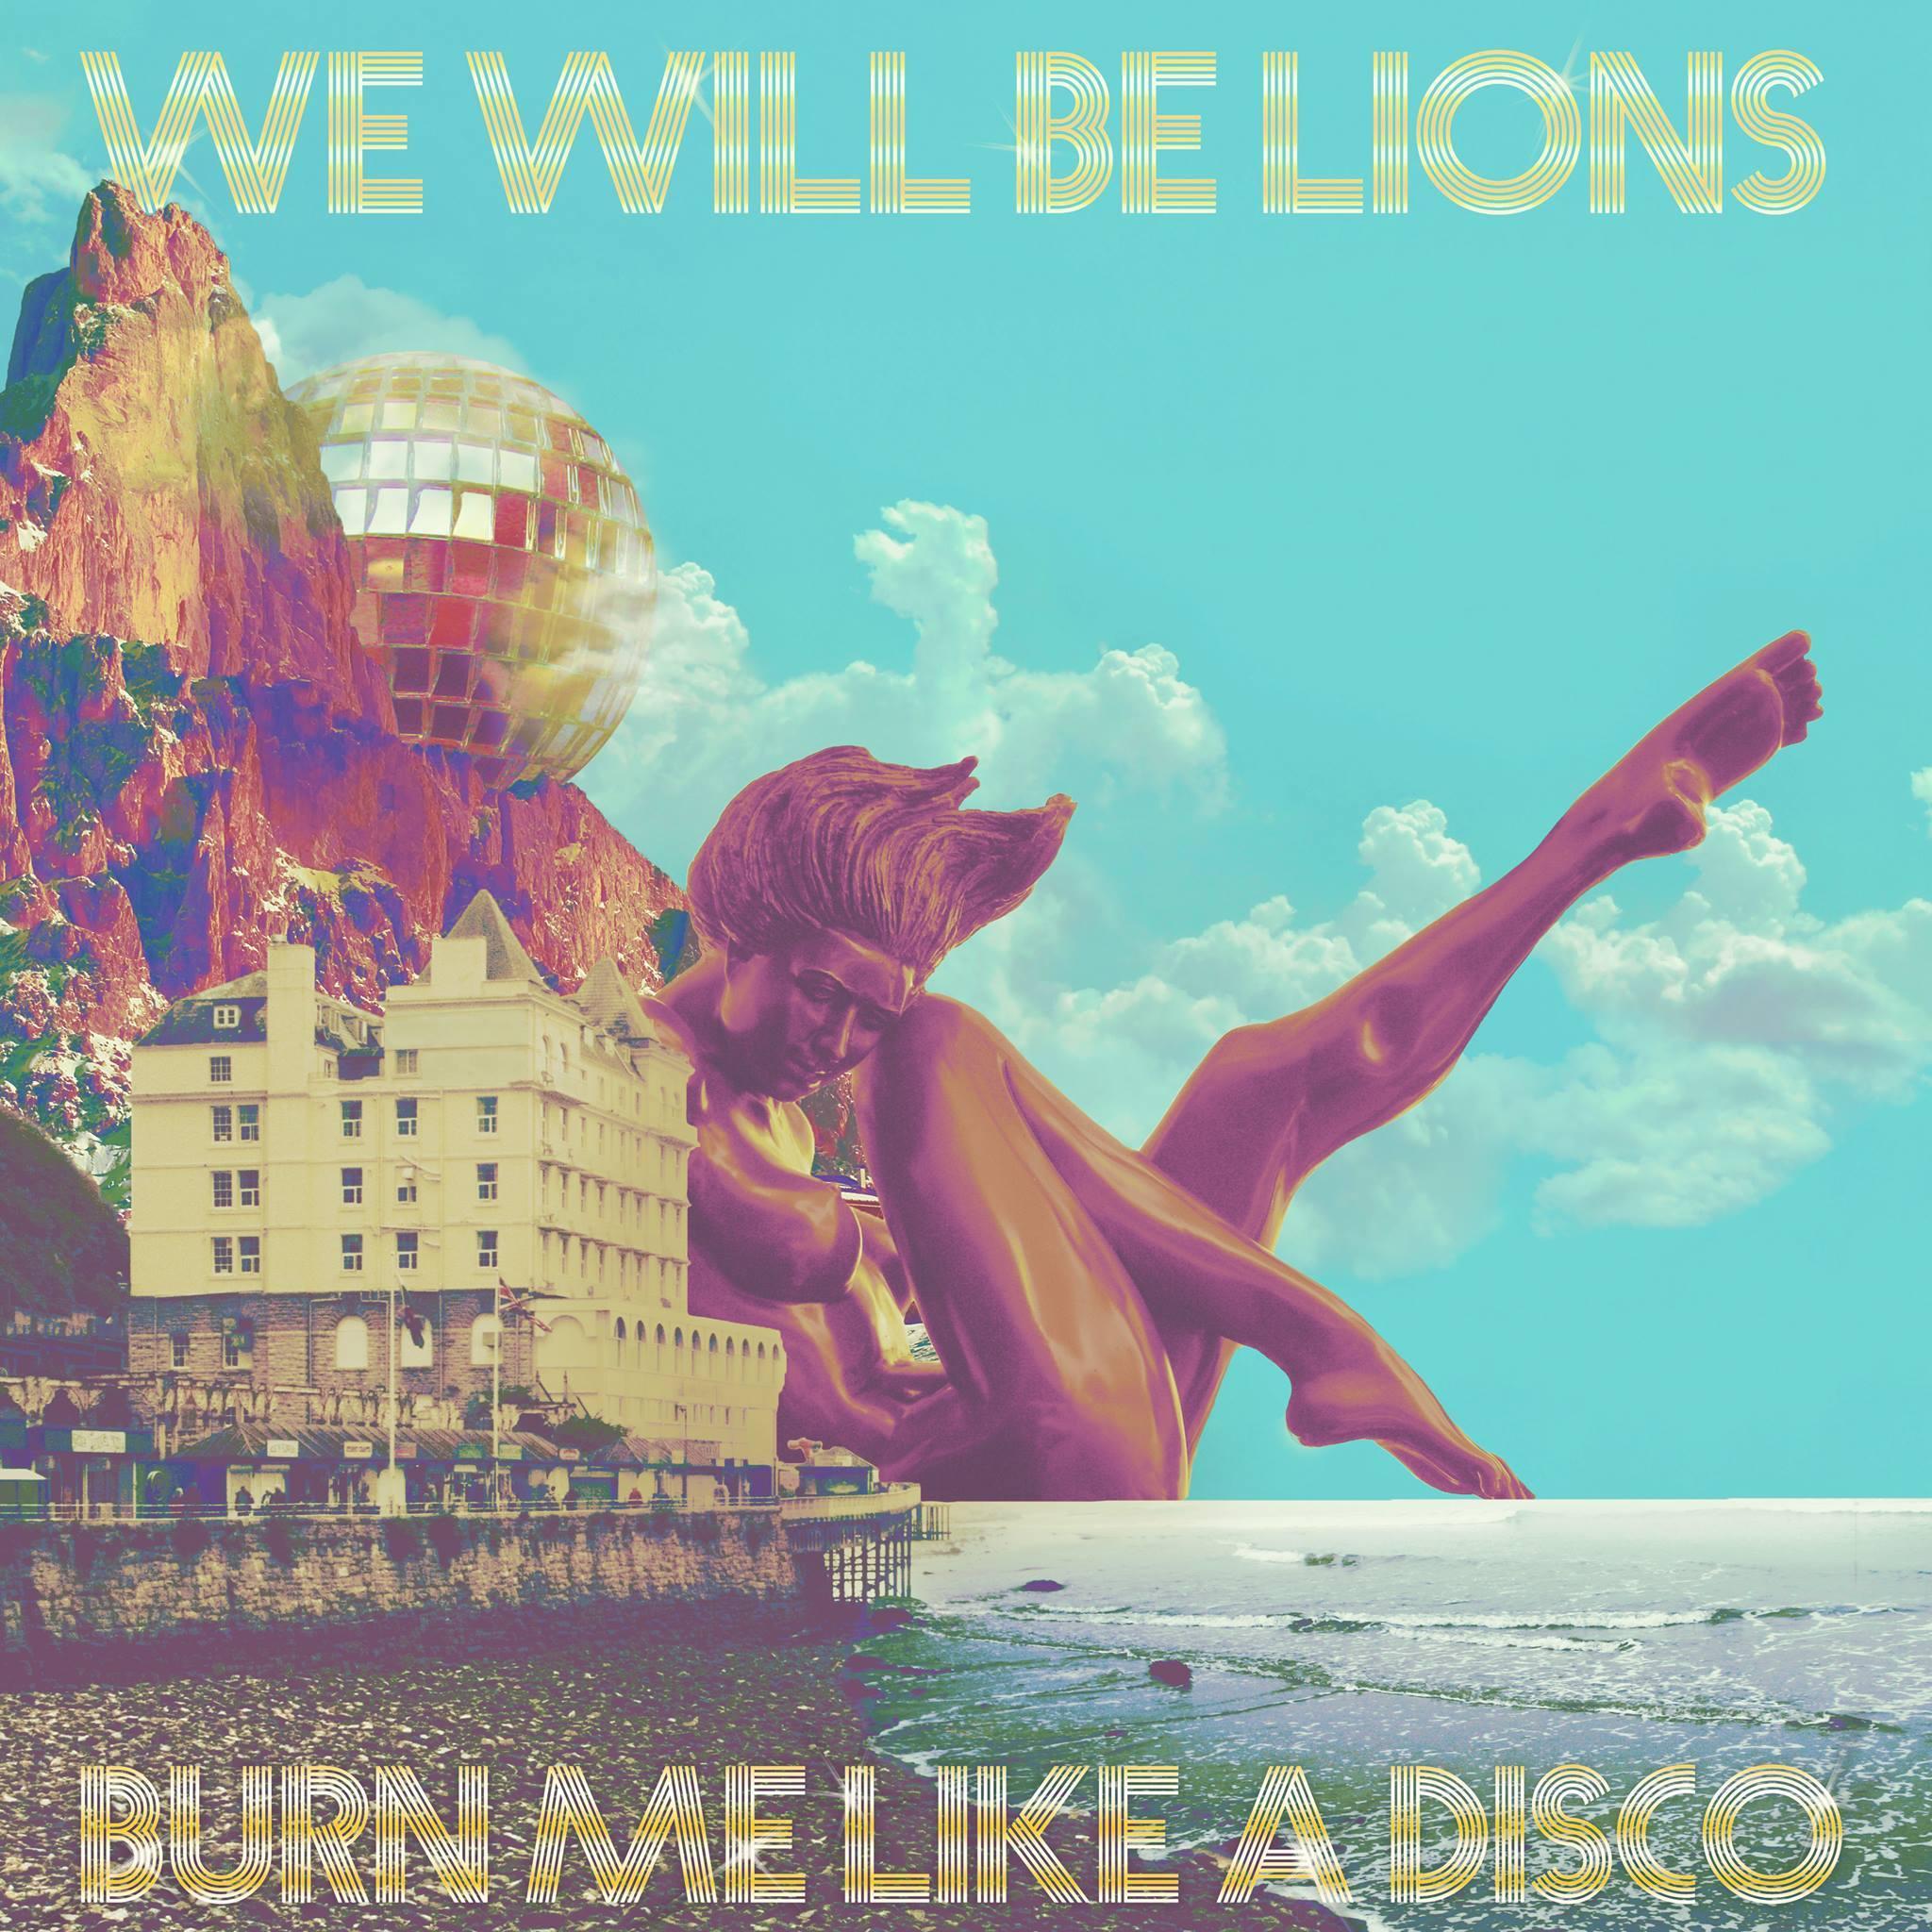 We Will Be Lions Album Artwork